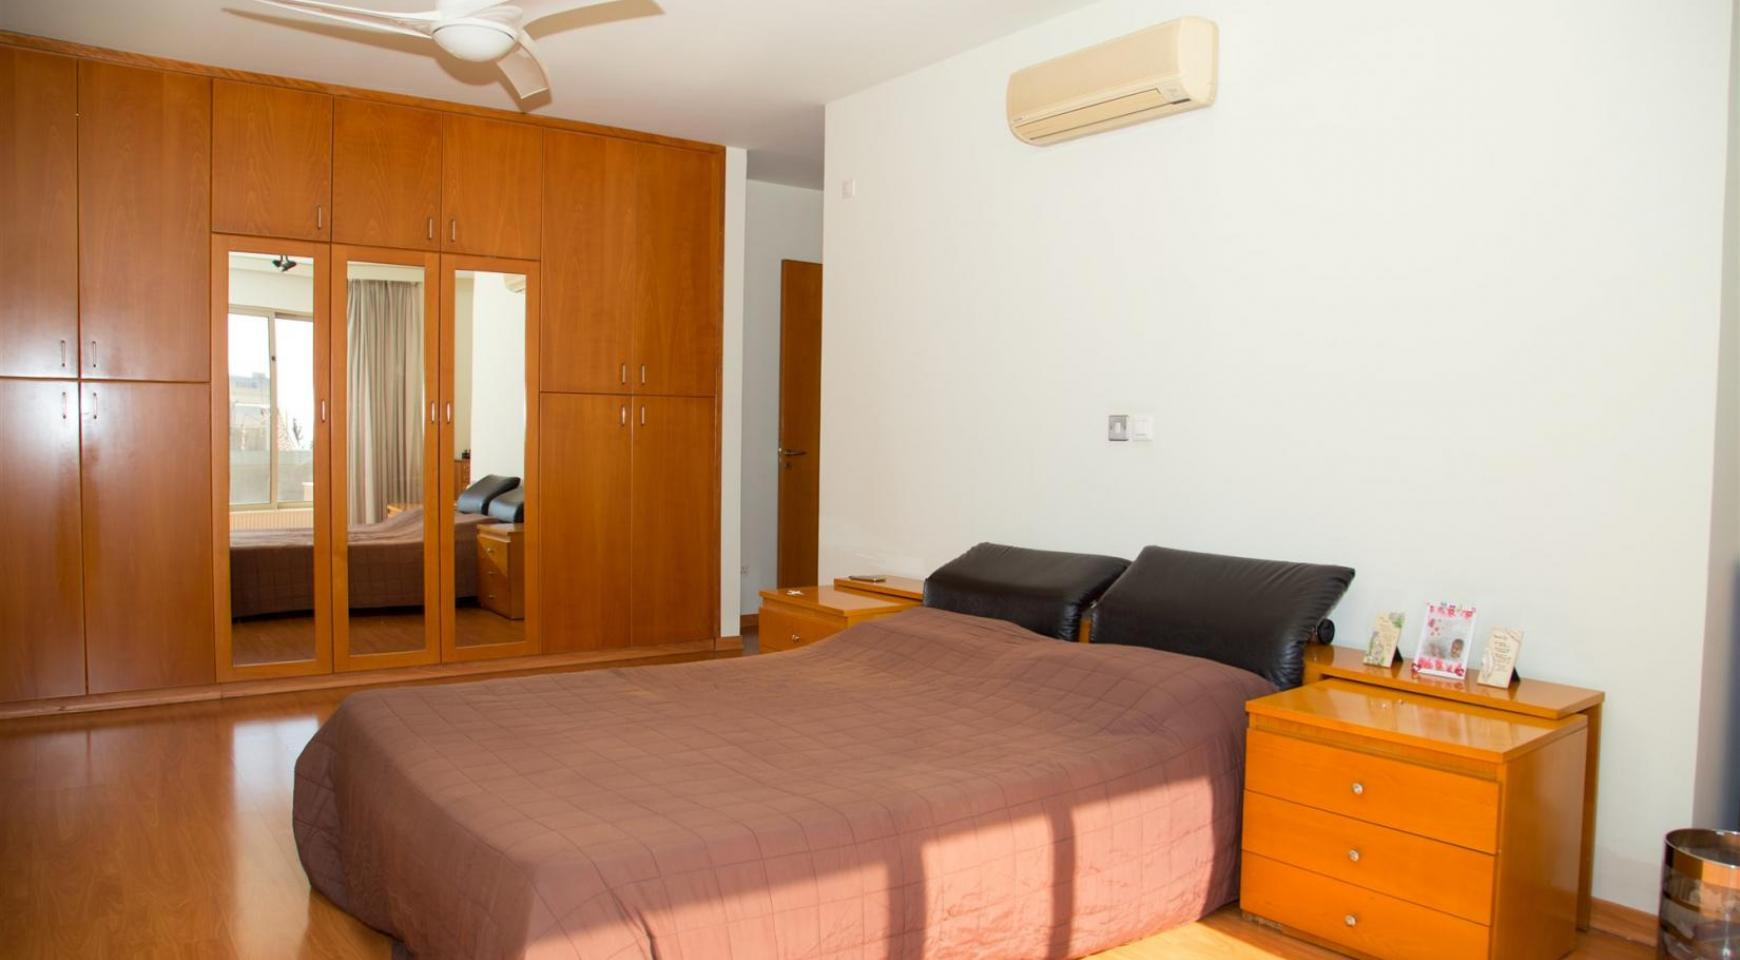 Modern Luxury 4 Bedroom Villa in Sfalagiotisa, Agios Athanasios - 30